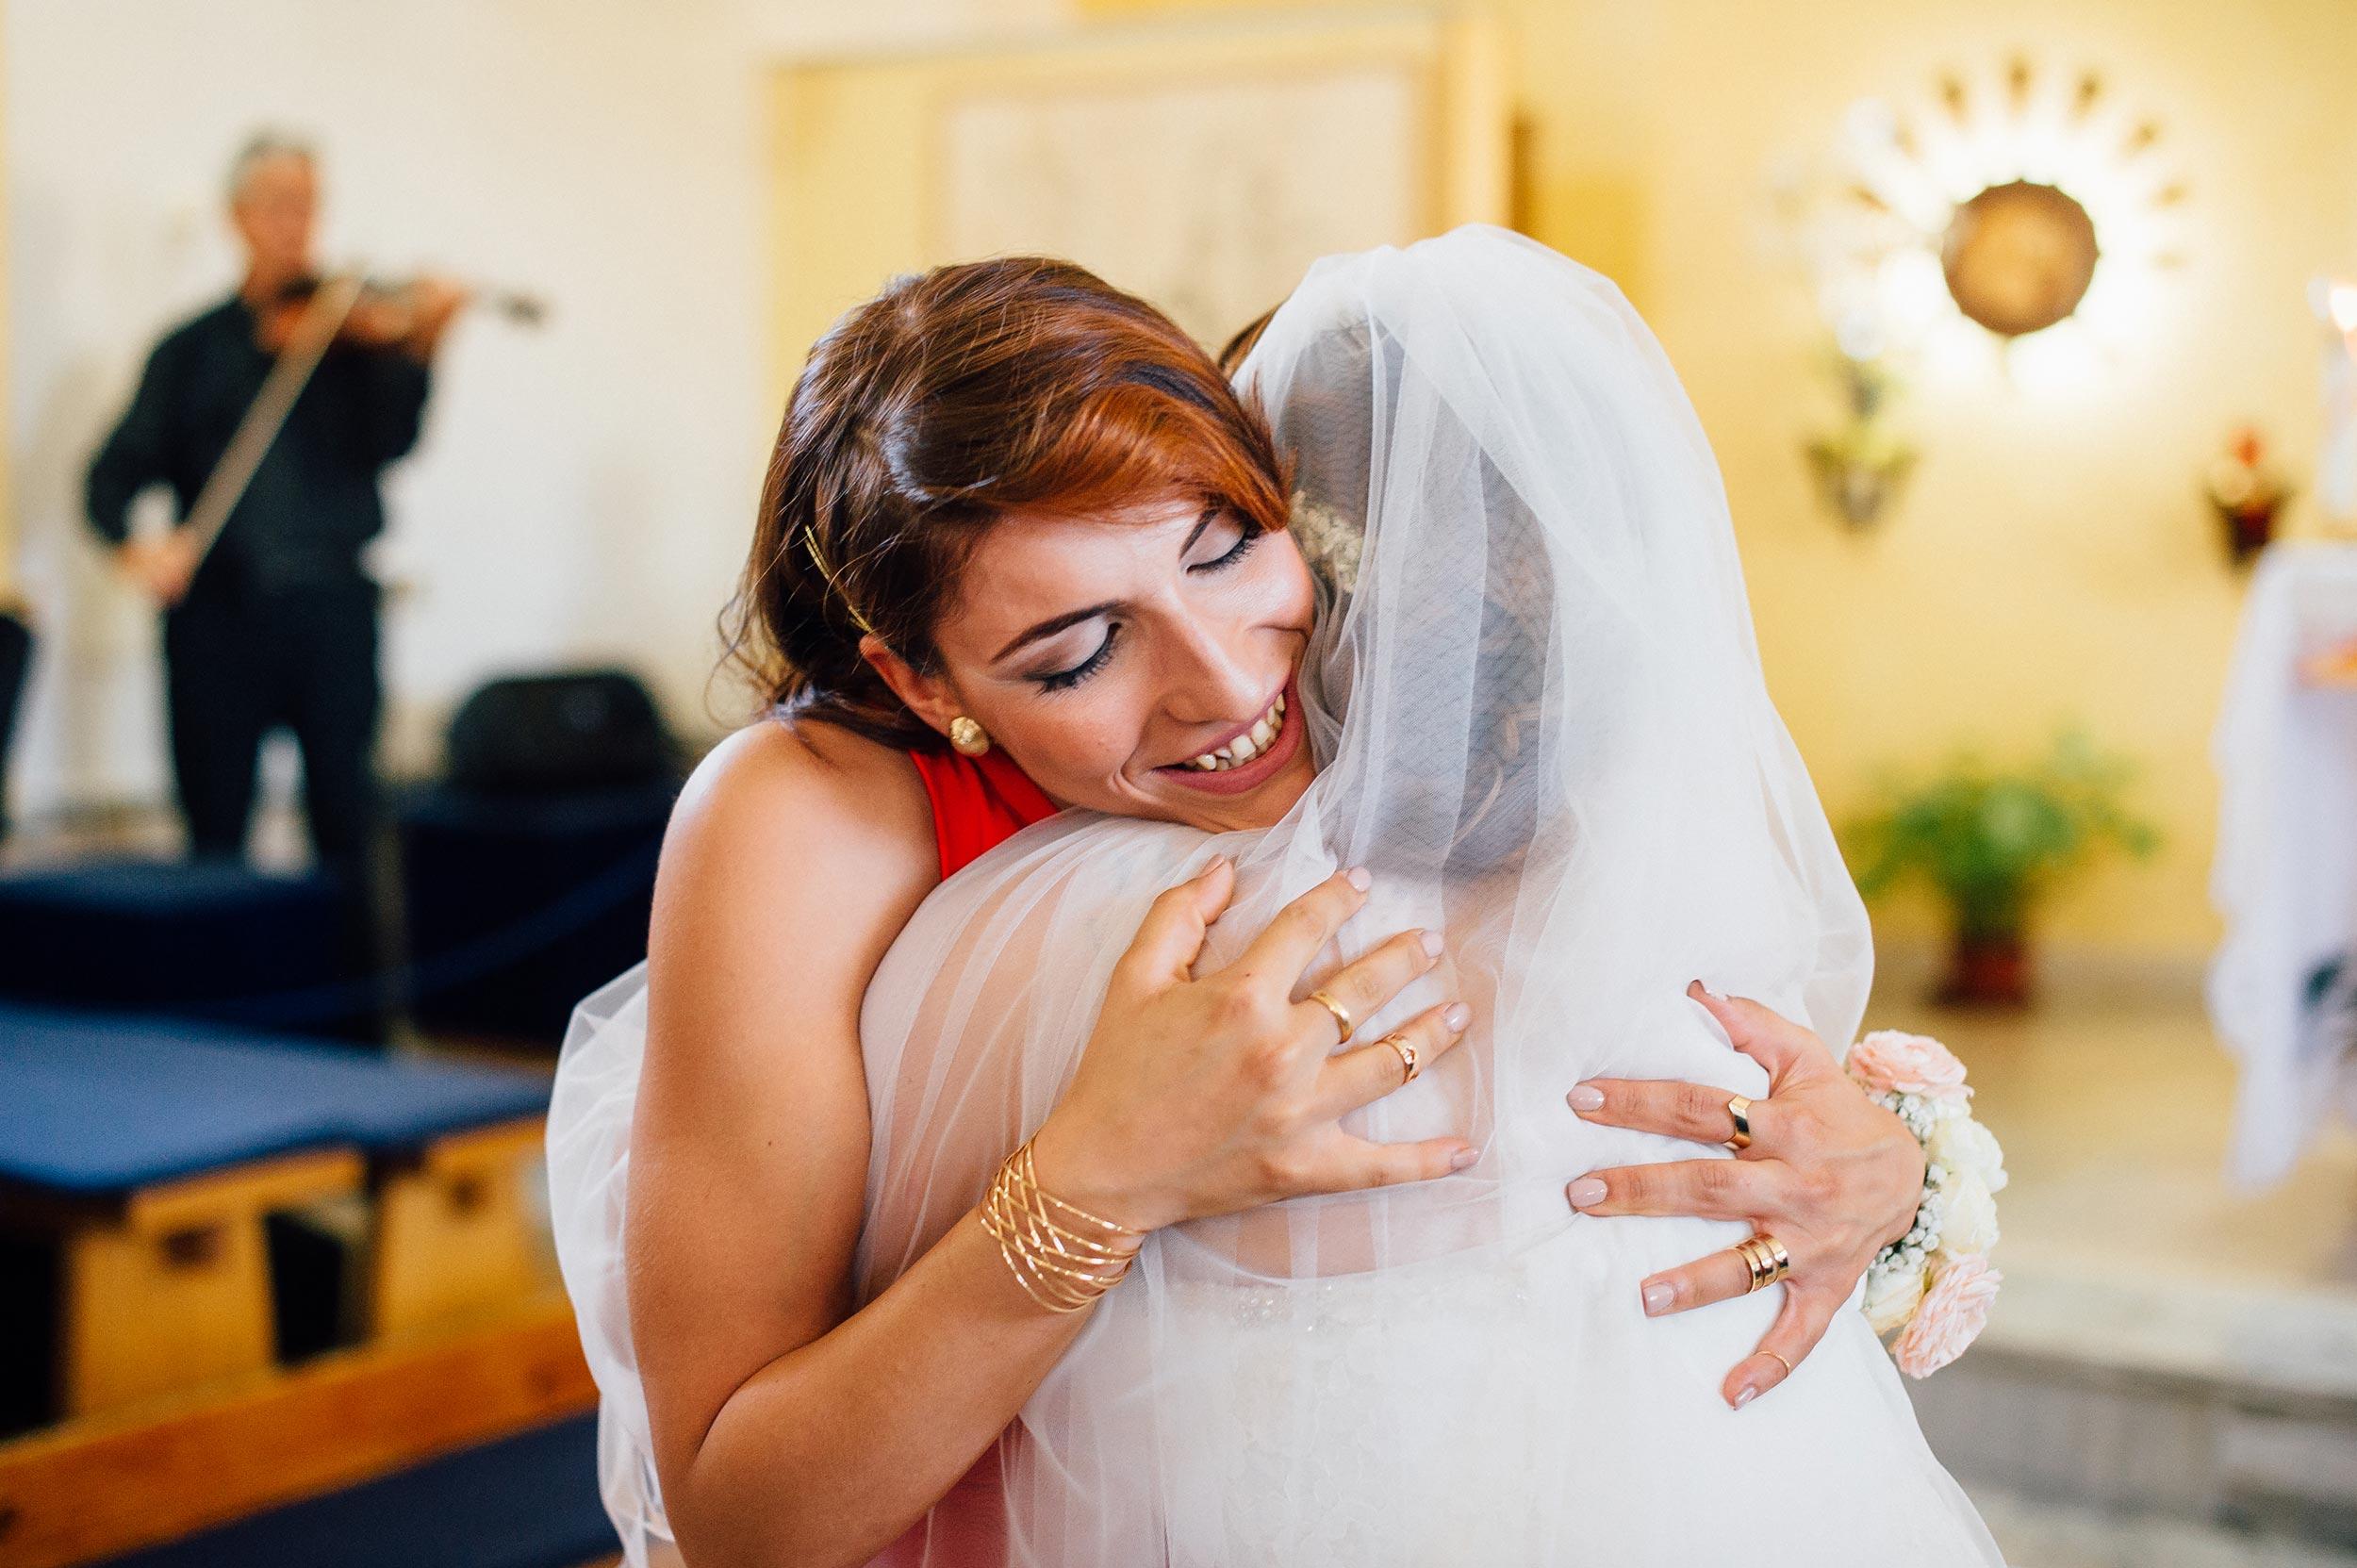 2016-Claudio-Teresa-Naples-Wedding-Photographer-Italy-Alessandro-Avenali-51.jpg